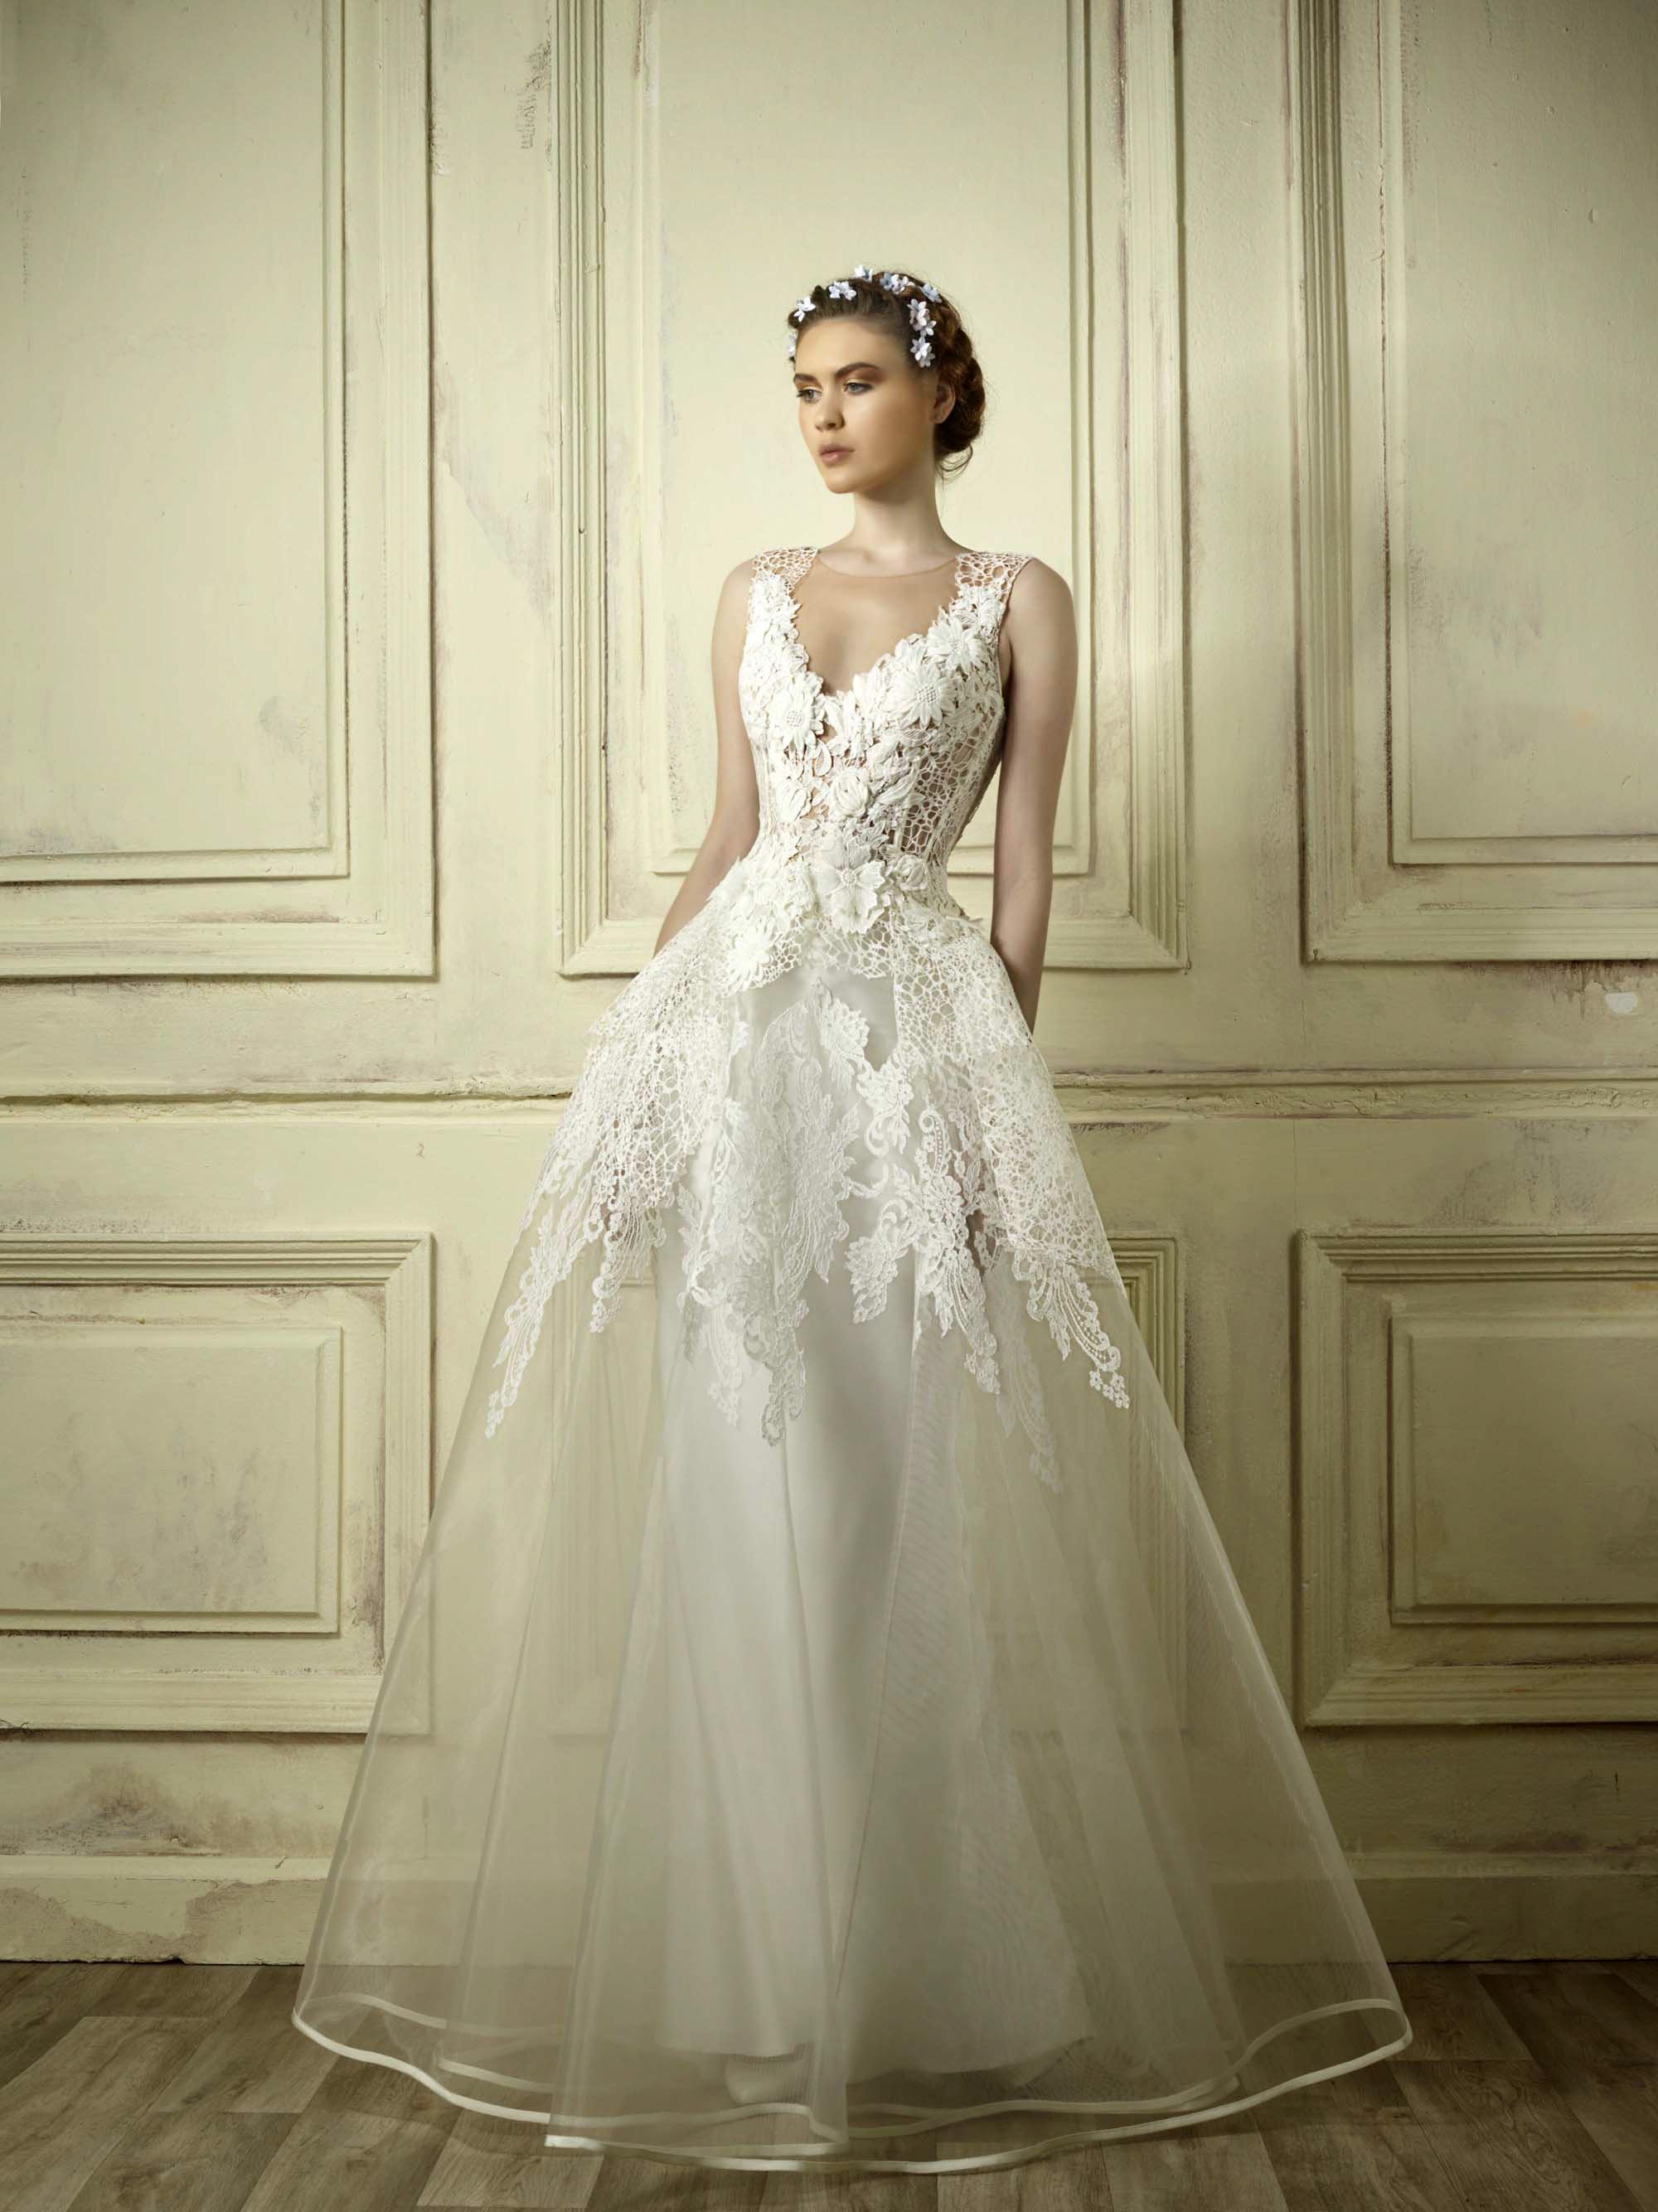 gemy maalouf lace a-line wedding dress spring 2018